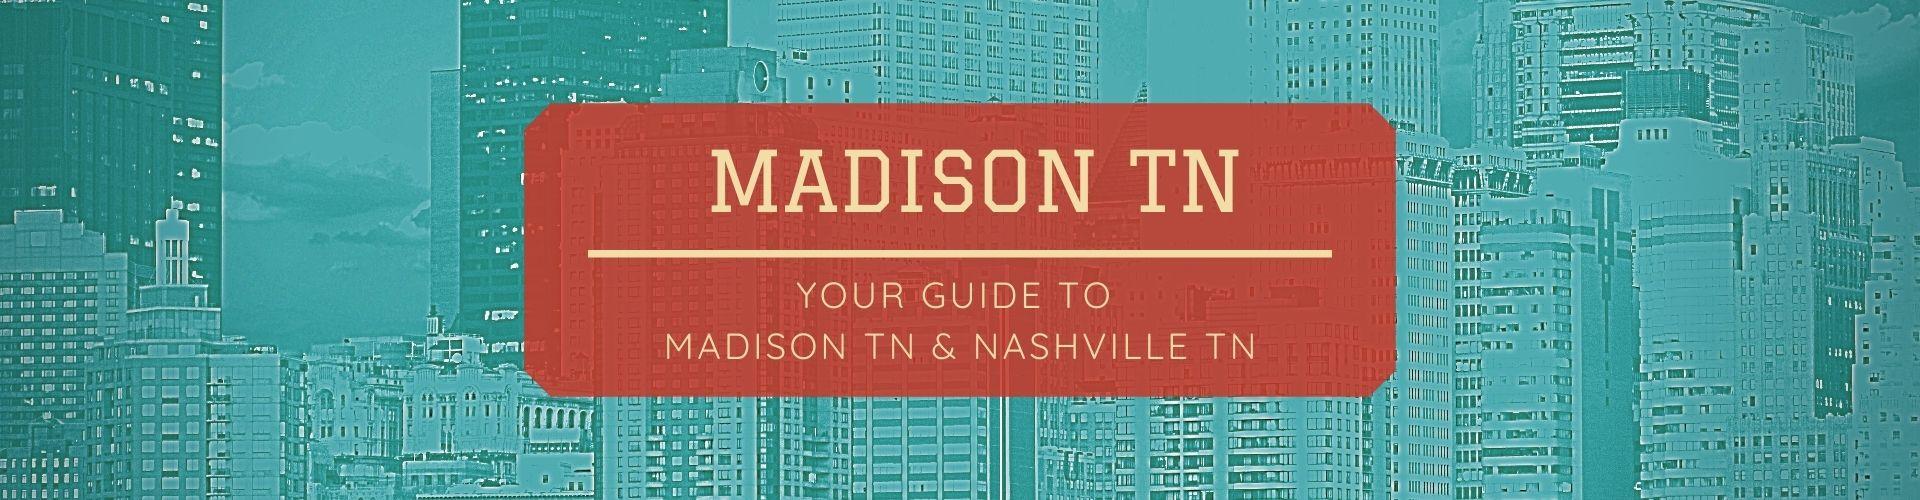 Madison TN